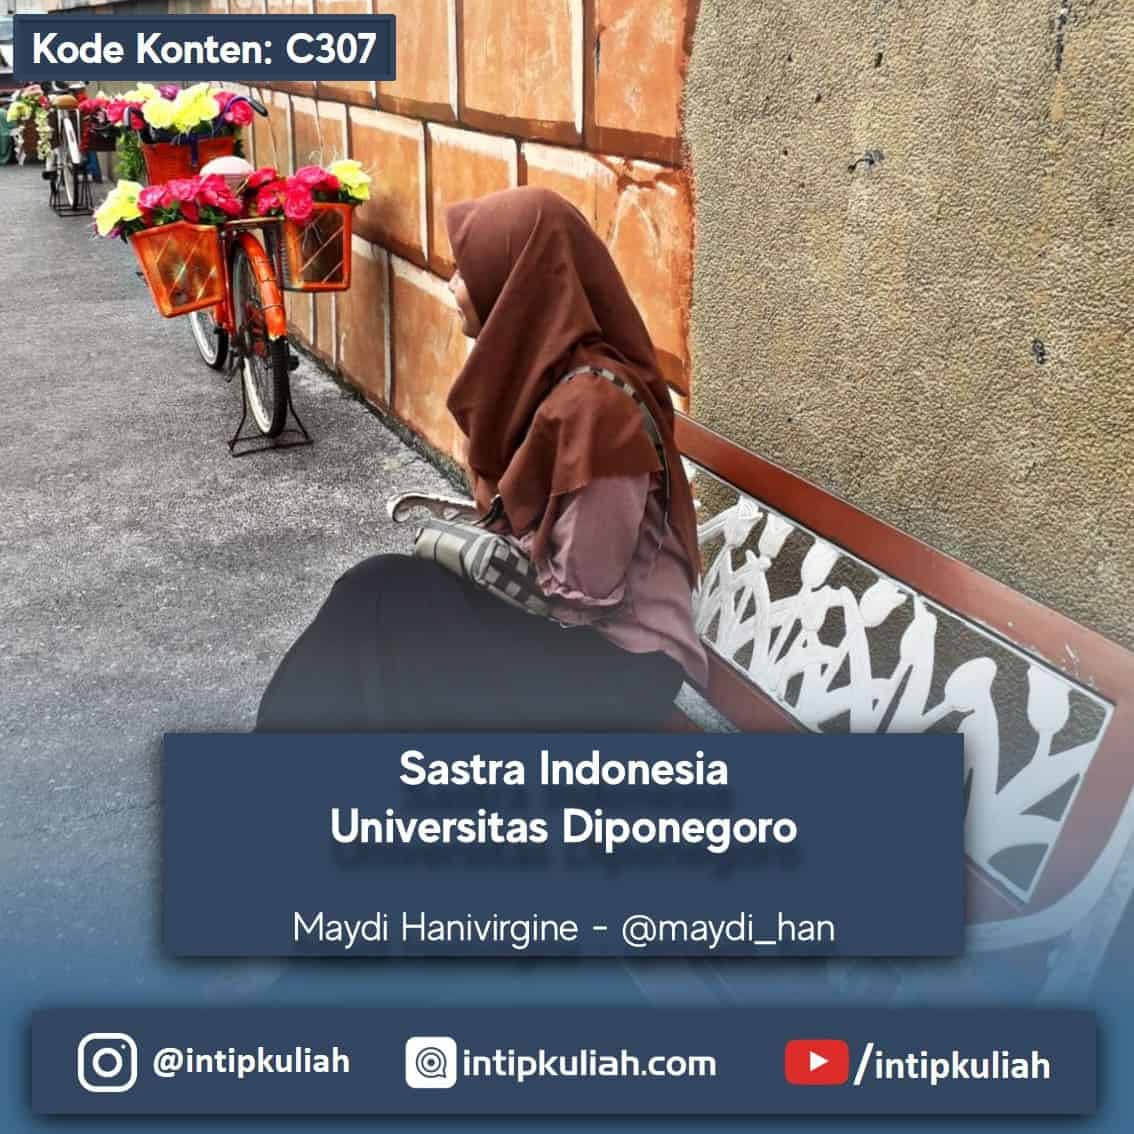 Sastra Indonesia Universitas Diponegoro (Maydi)